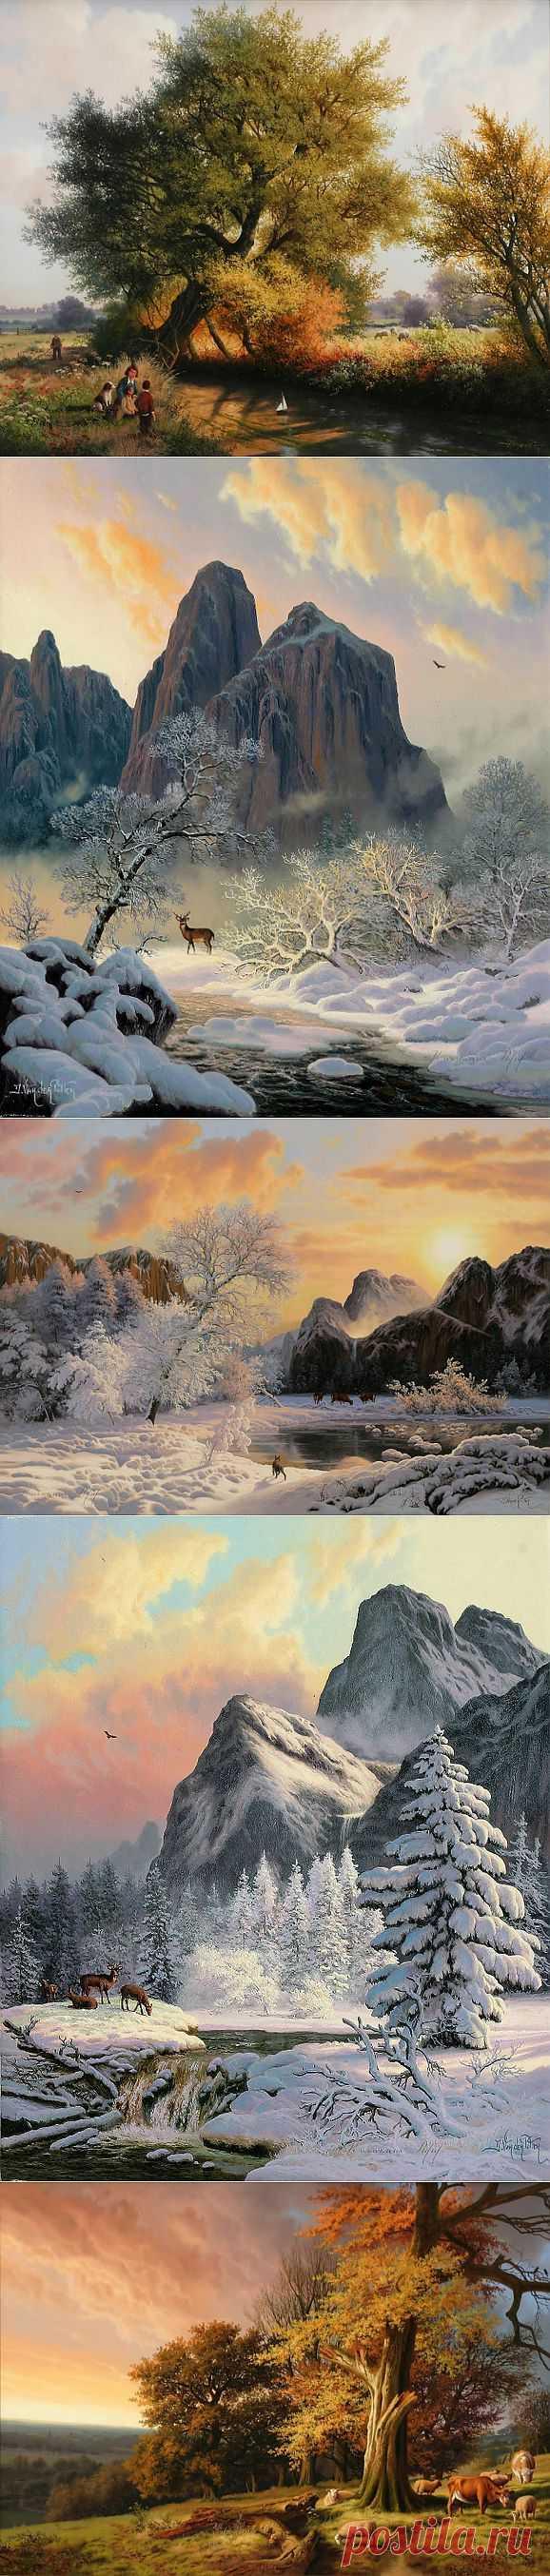 Художник пейзажей Даниэль ван дер Путтен.